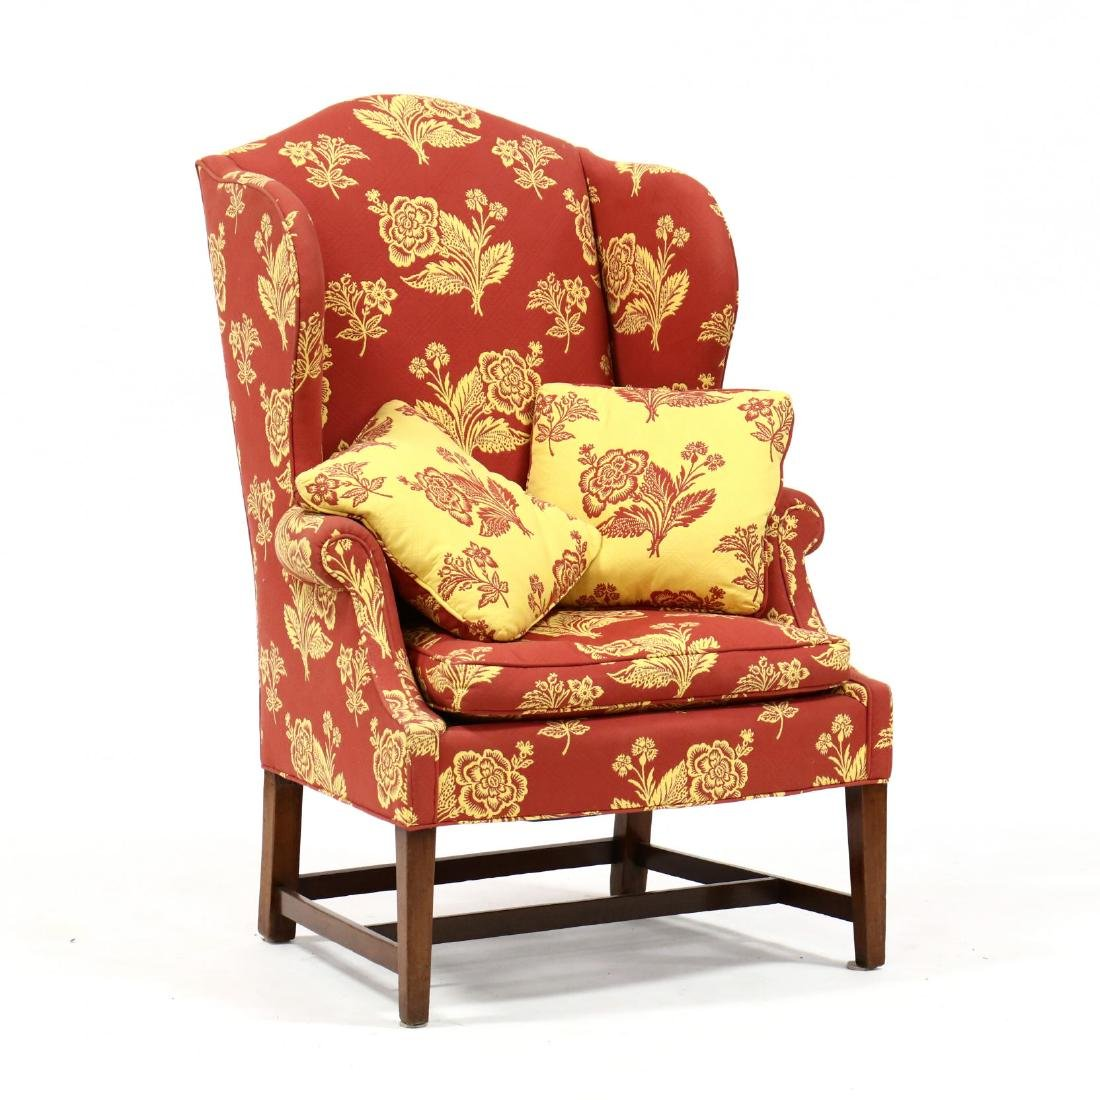 American Hepplewhite Wing Back Chair